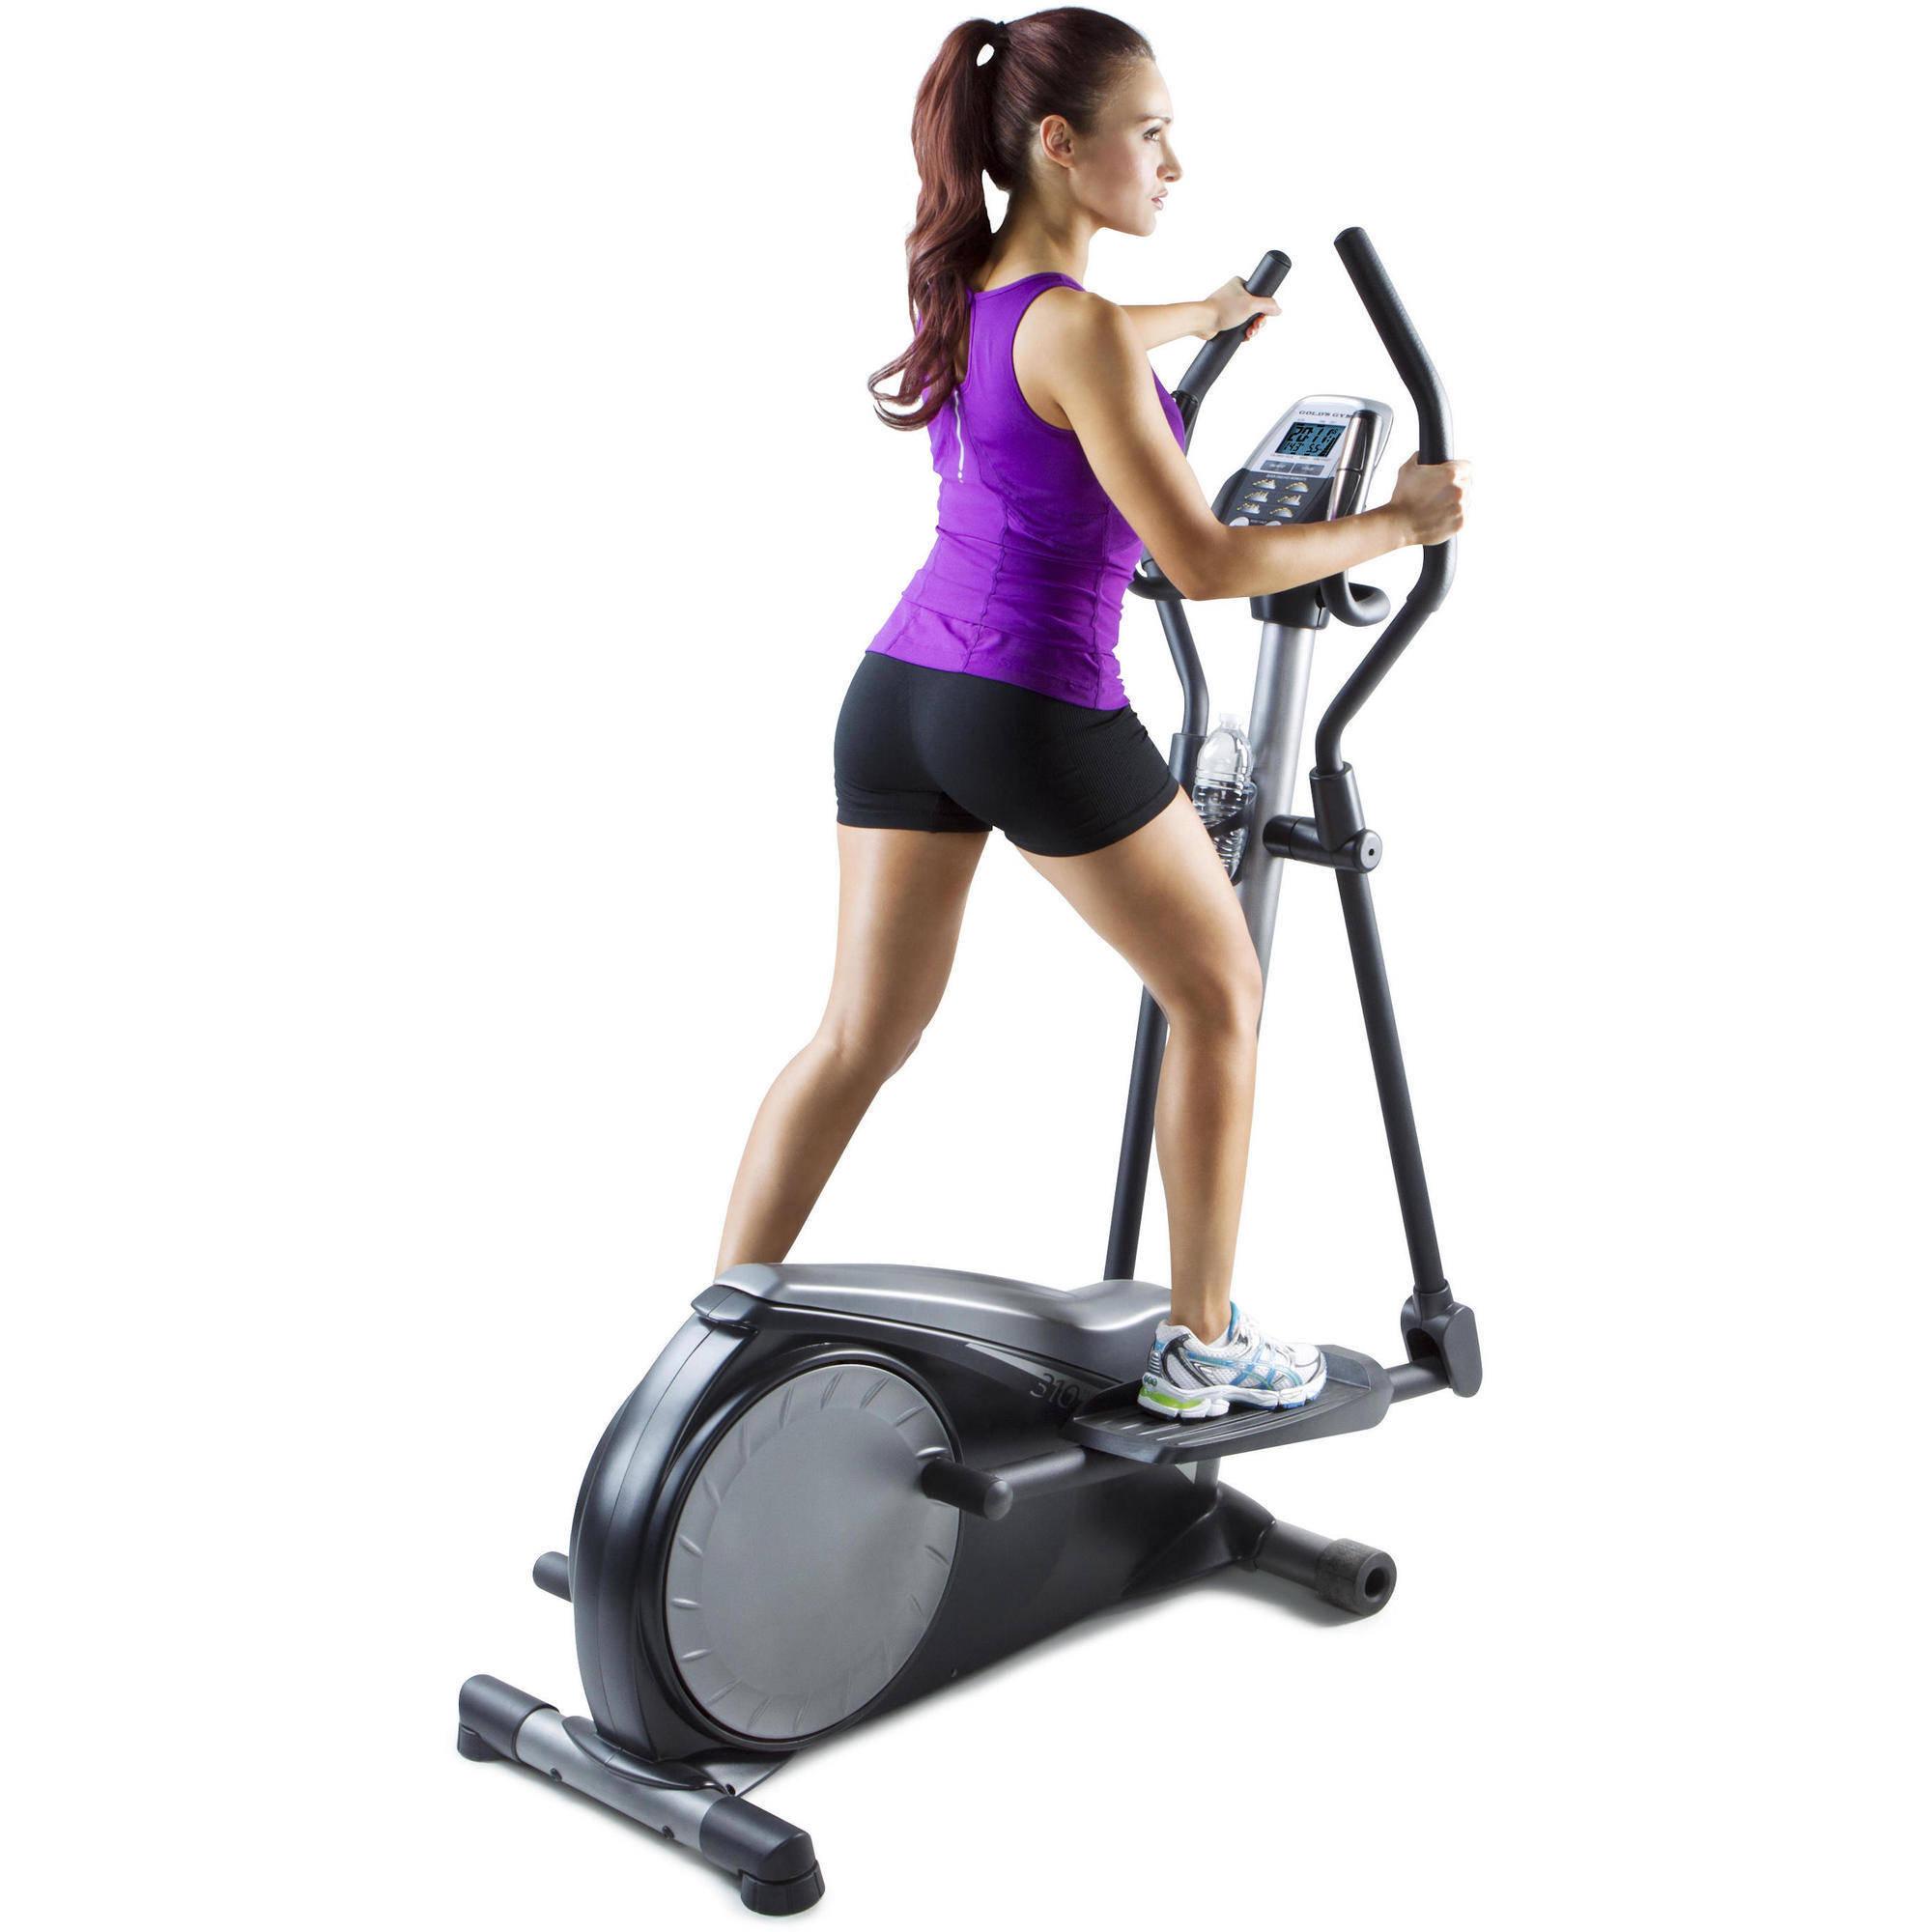 Gold's Gym StrideTrainer 310 Elliptical